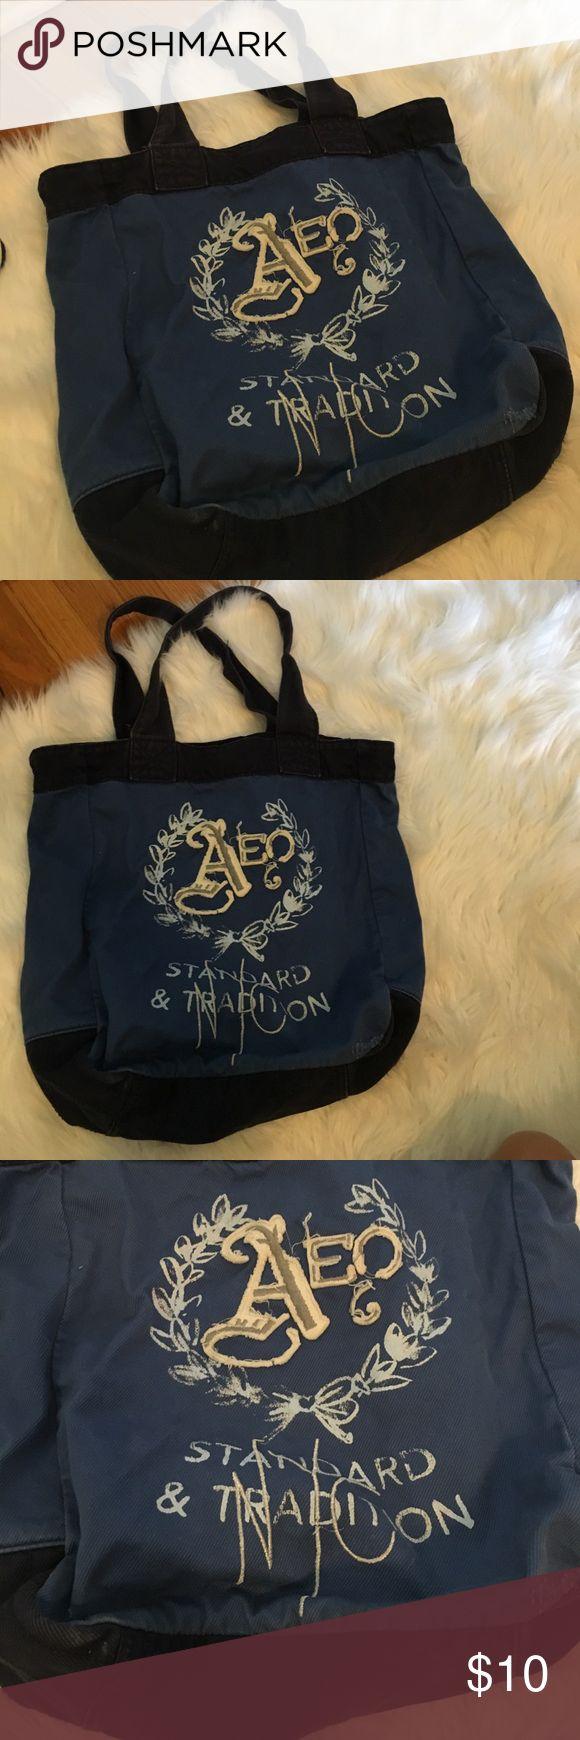 American eagle blue tote. Shoulder bag AEO blue tote. With zipper pocket on inside. Good condition American Eagle Outfitters Bags Shoulder Bags